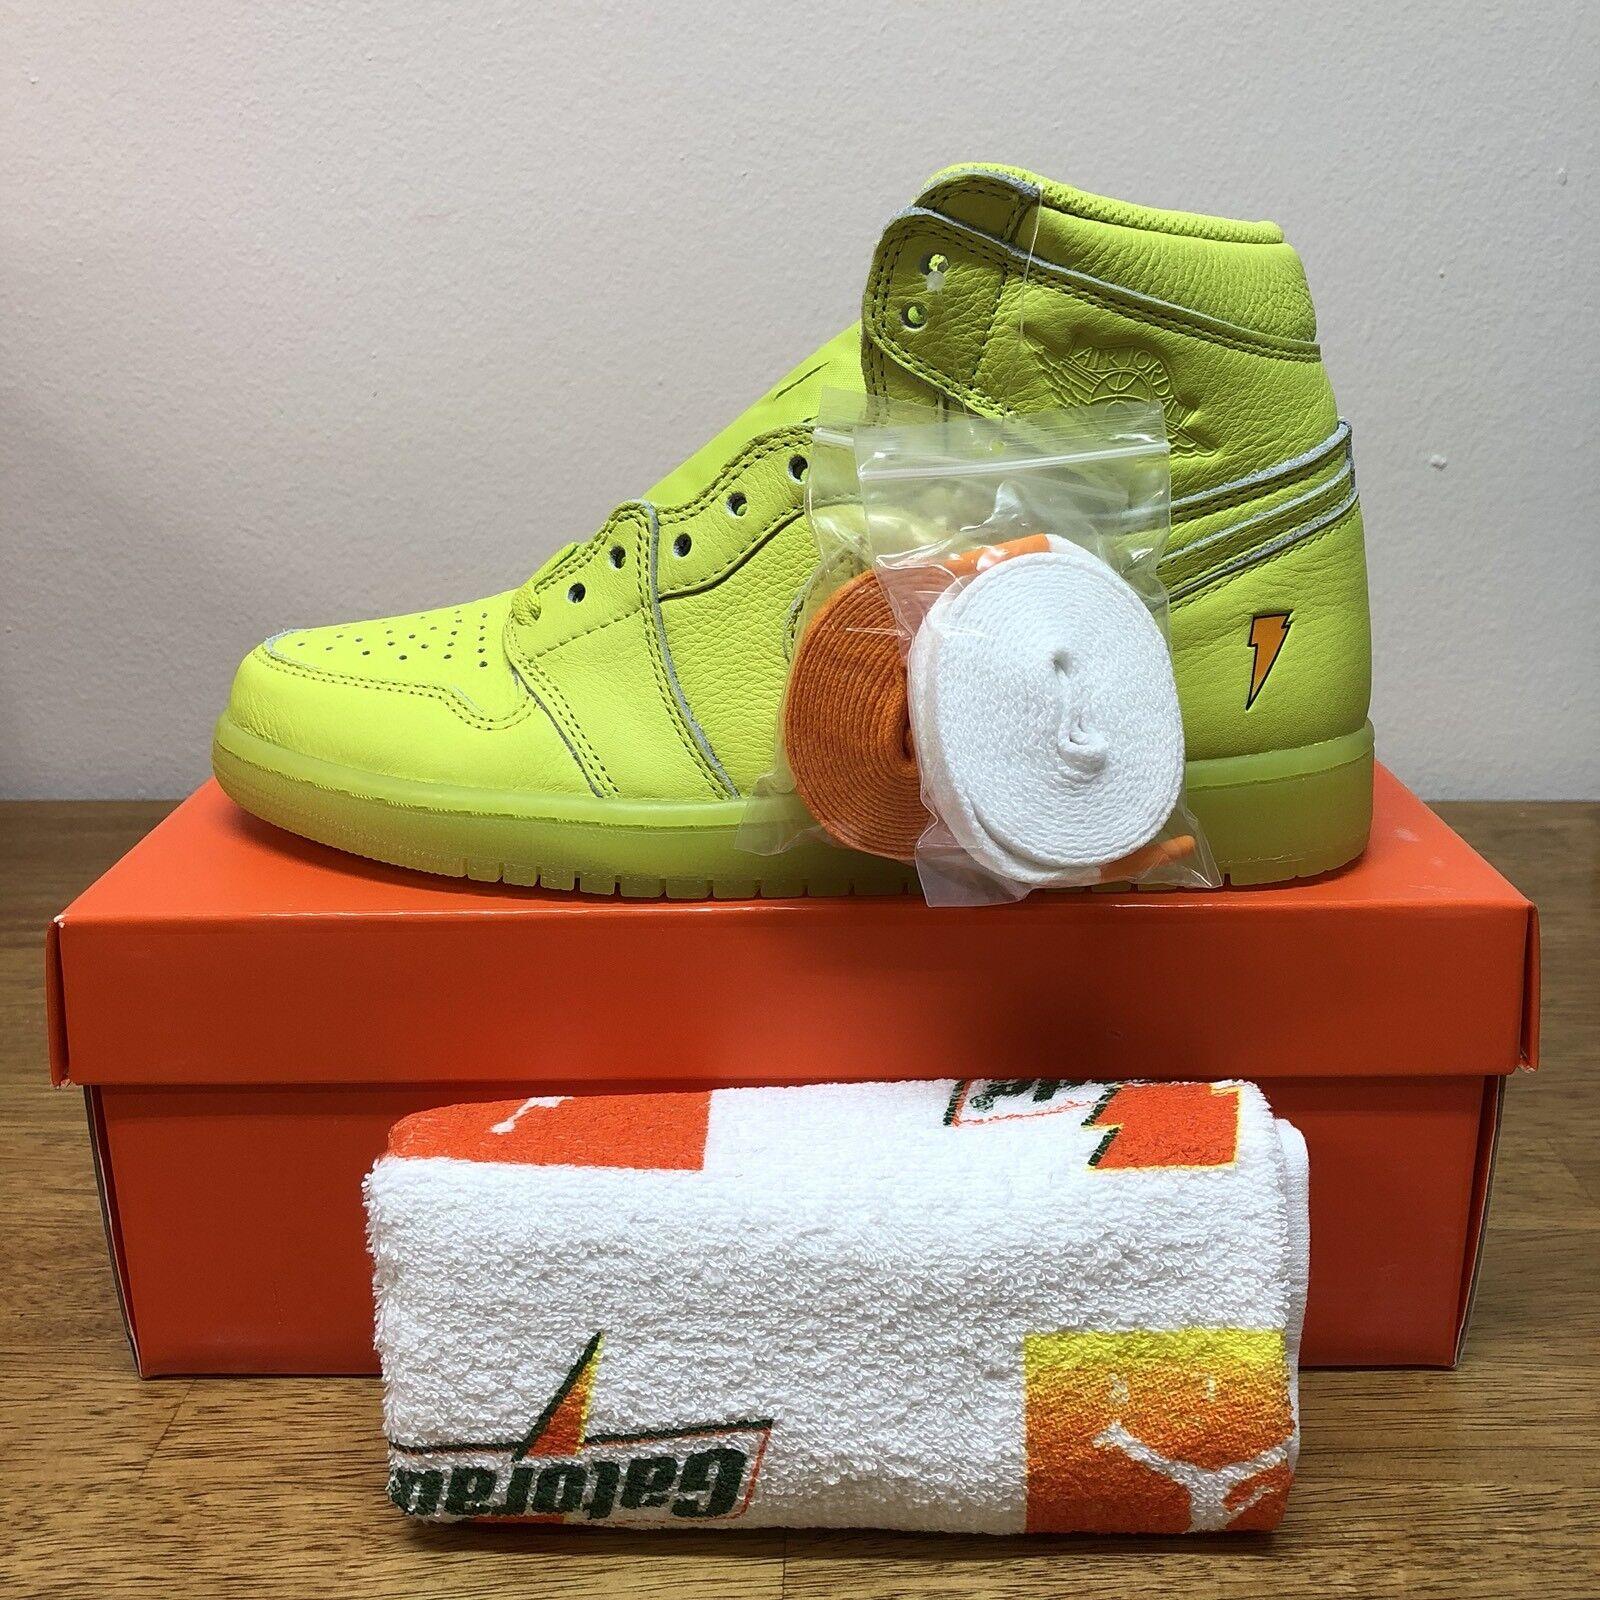 Nike Air Jordan 1 Retro High OG Gatorade Lemon Lime Cyber Yellow AJ5997-345